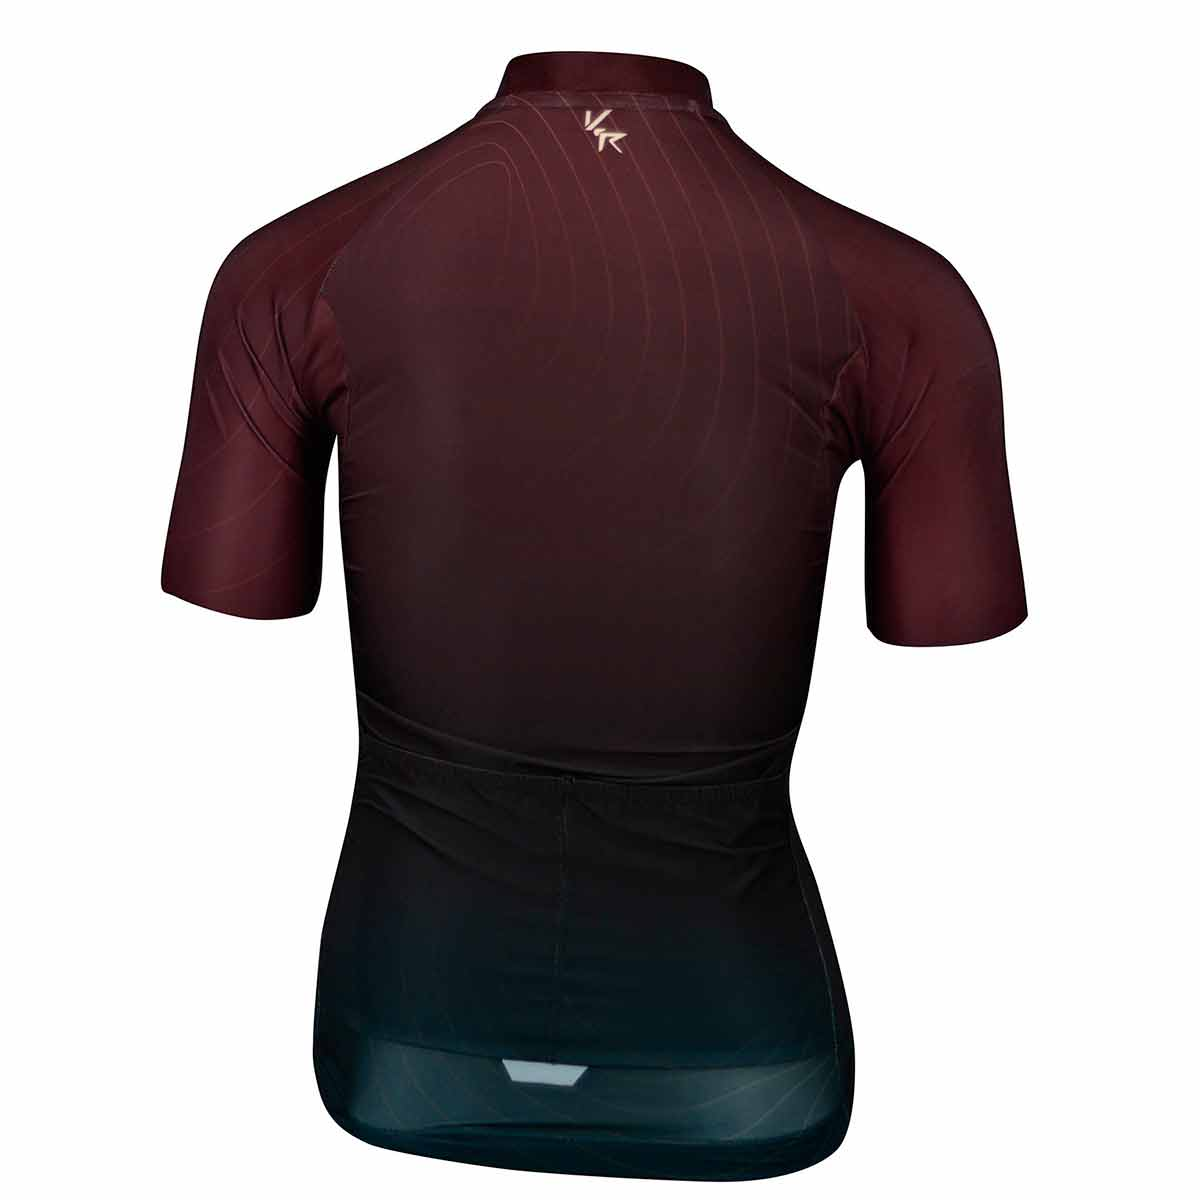 Camisa Velorock Coleção Carbon Ultra XC Feminina